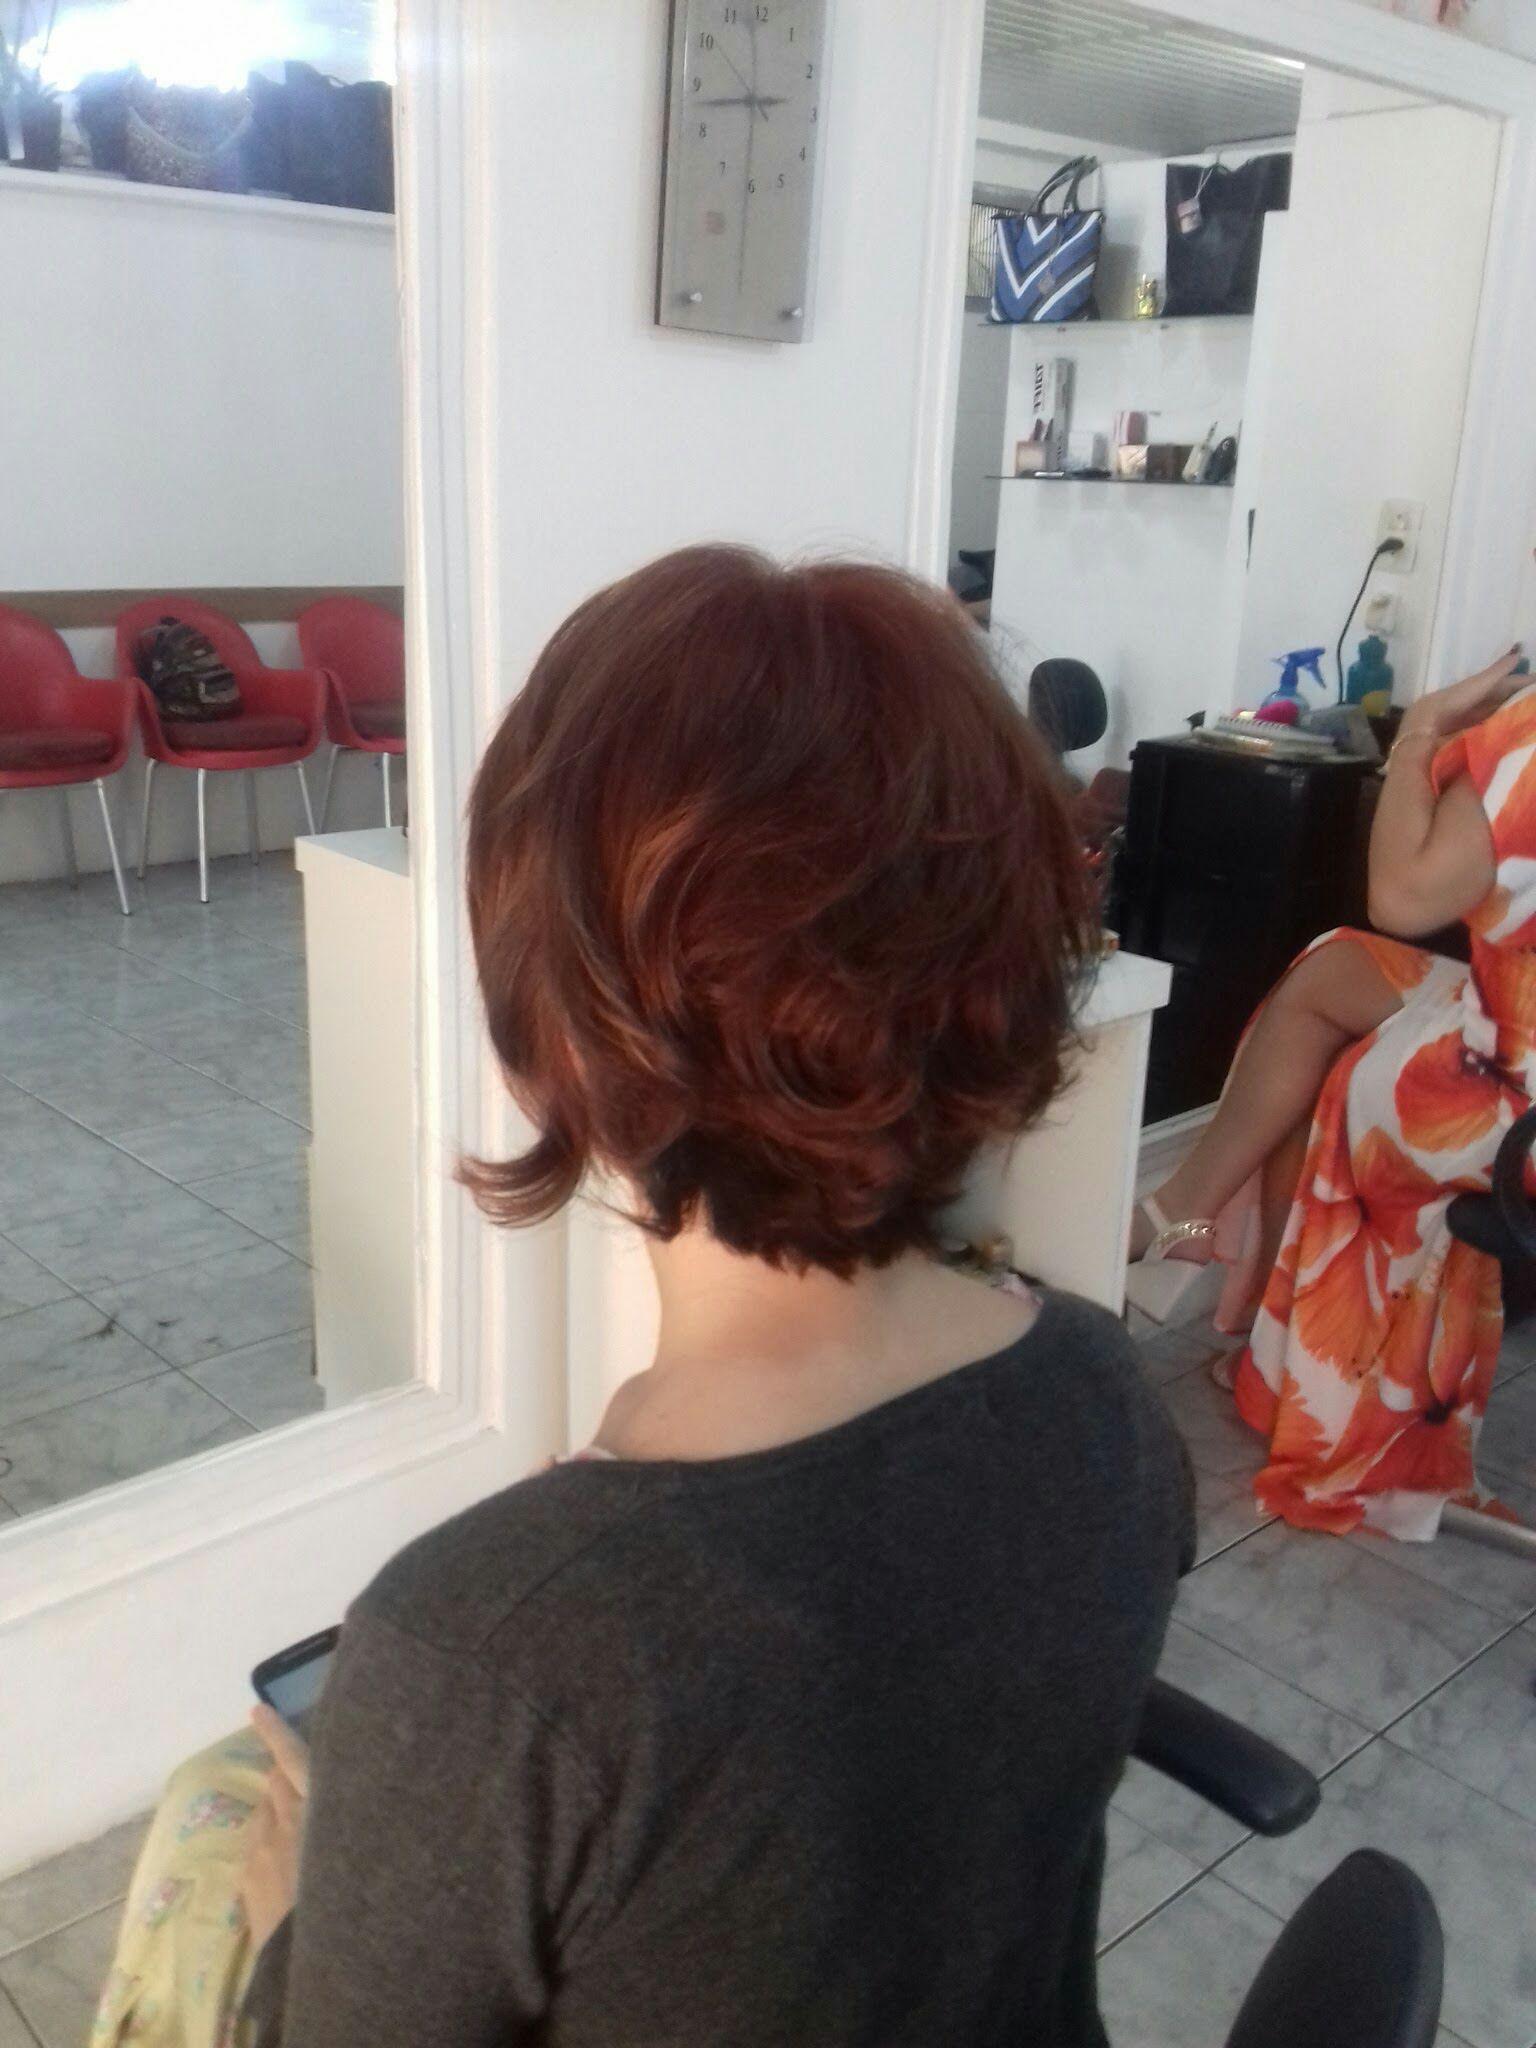 Muita cor cabeleireiro(a)